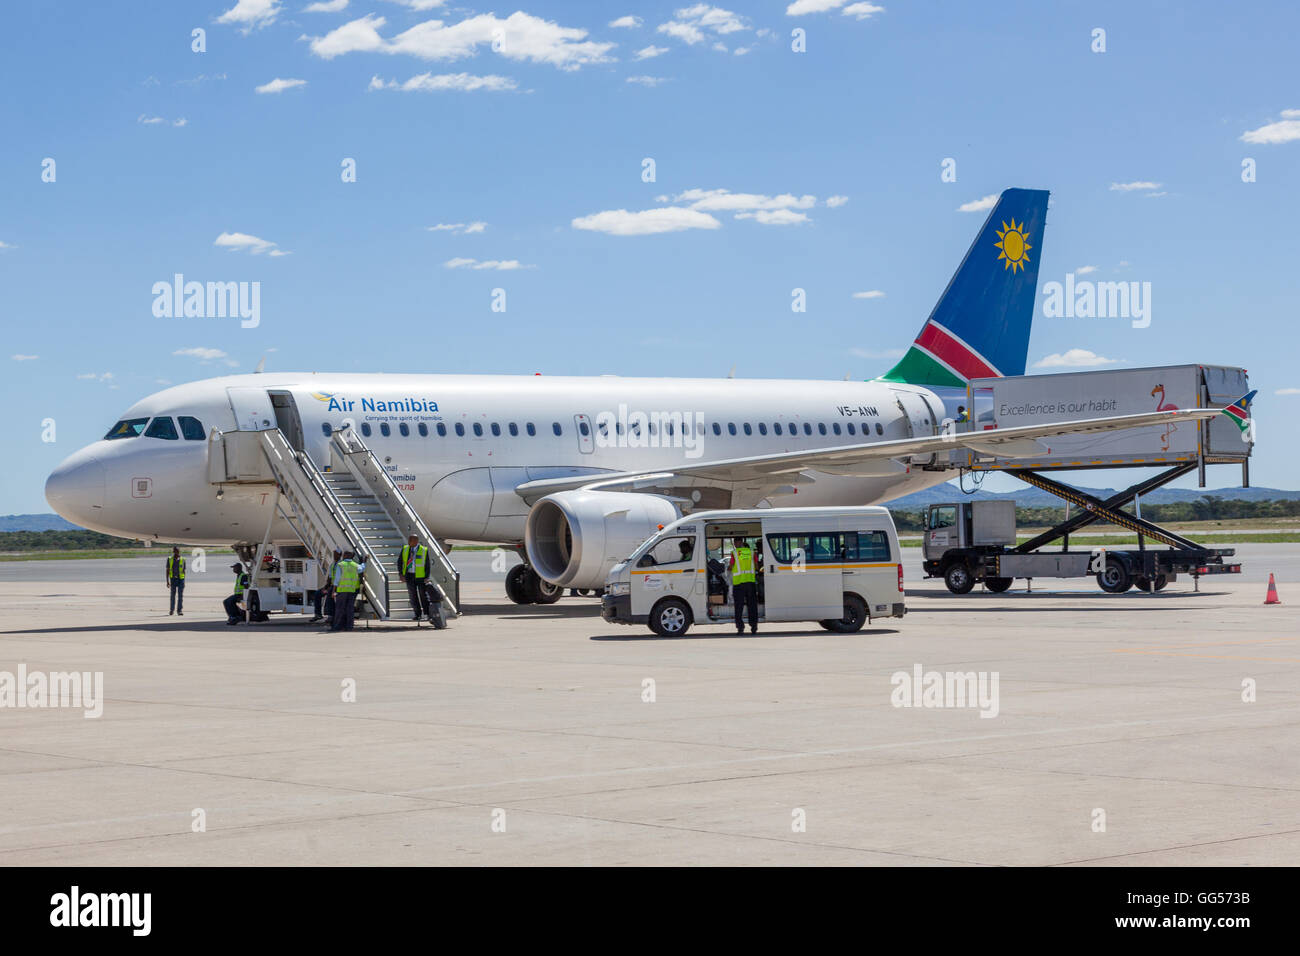 Namibia Air Namibia - Airbus A319-112 V5-ANM at Windhoek Hosea Kutako International Airport - Stock Image